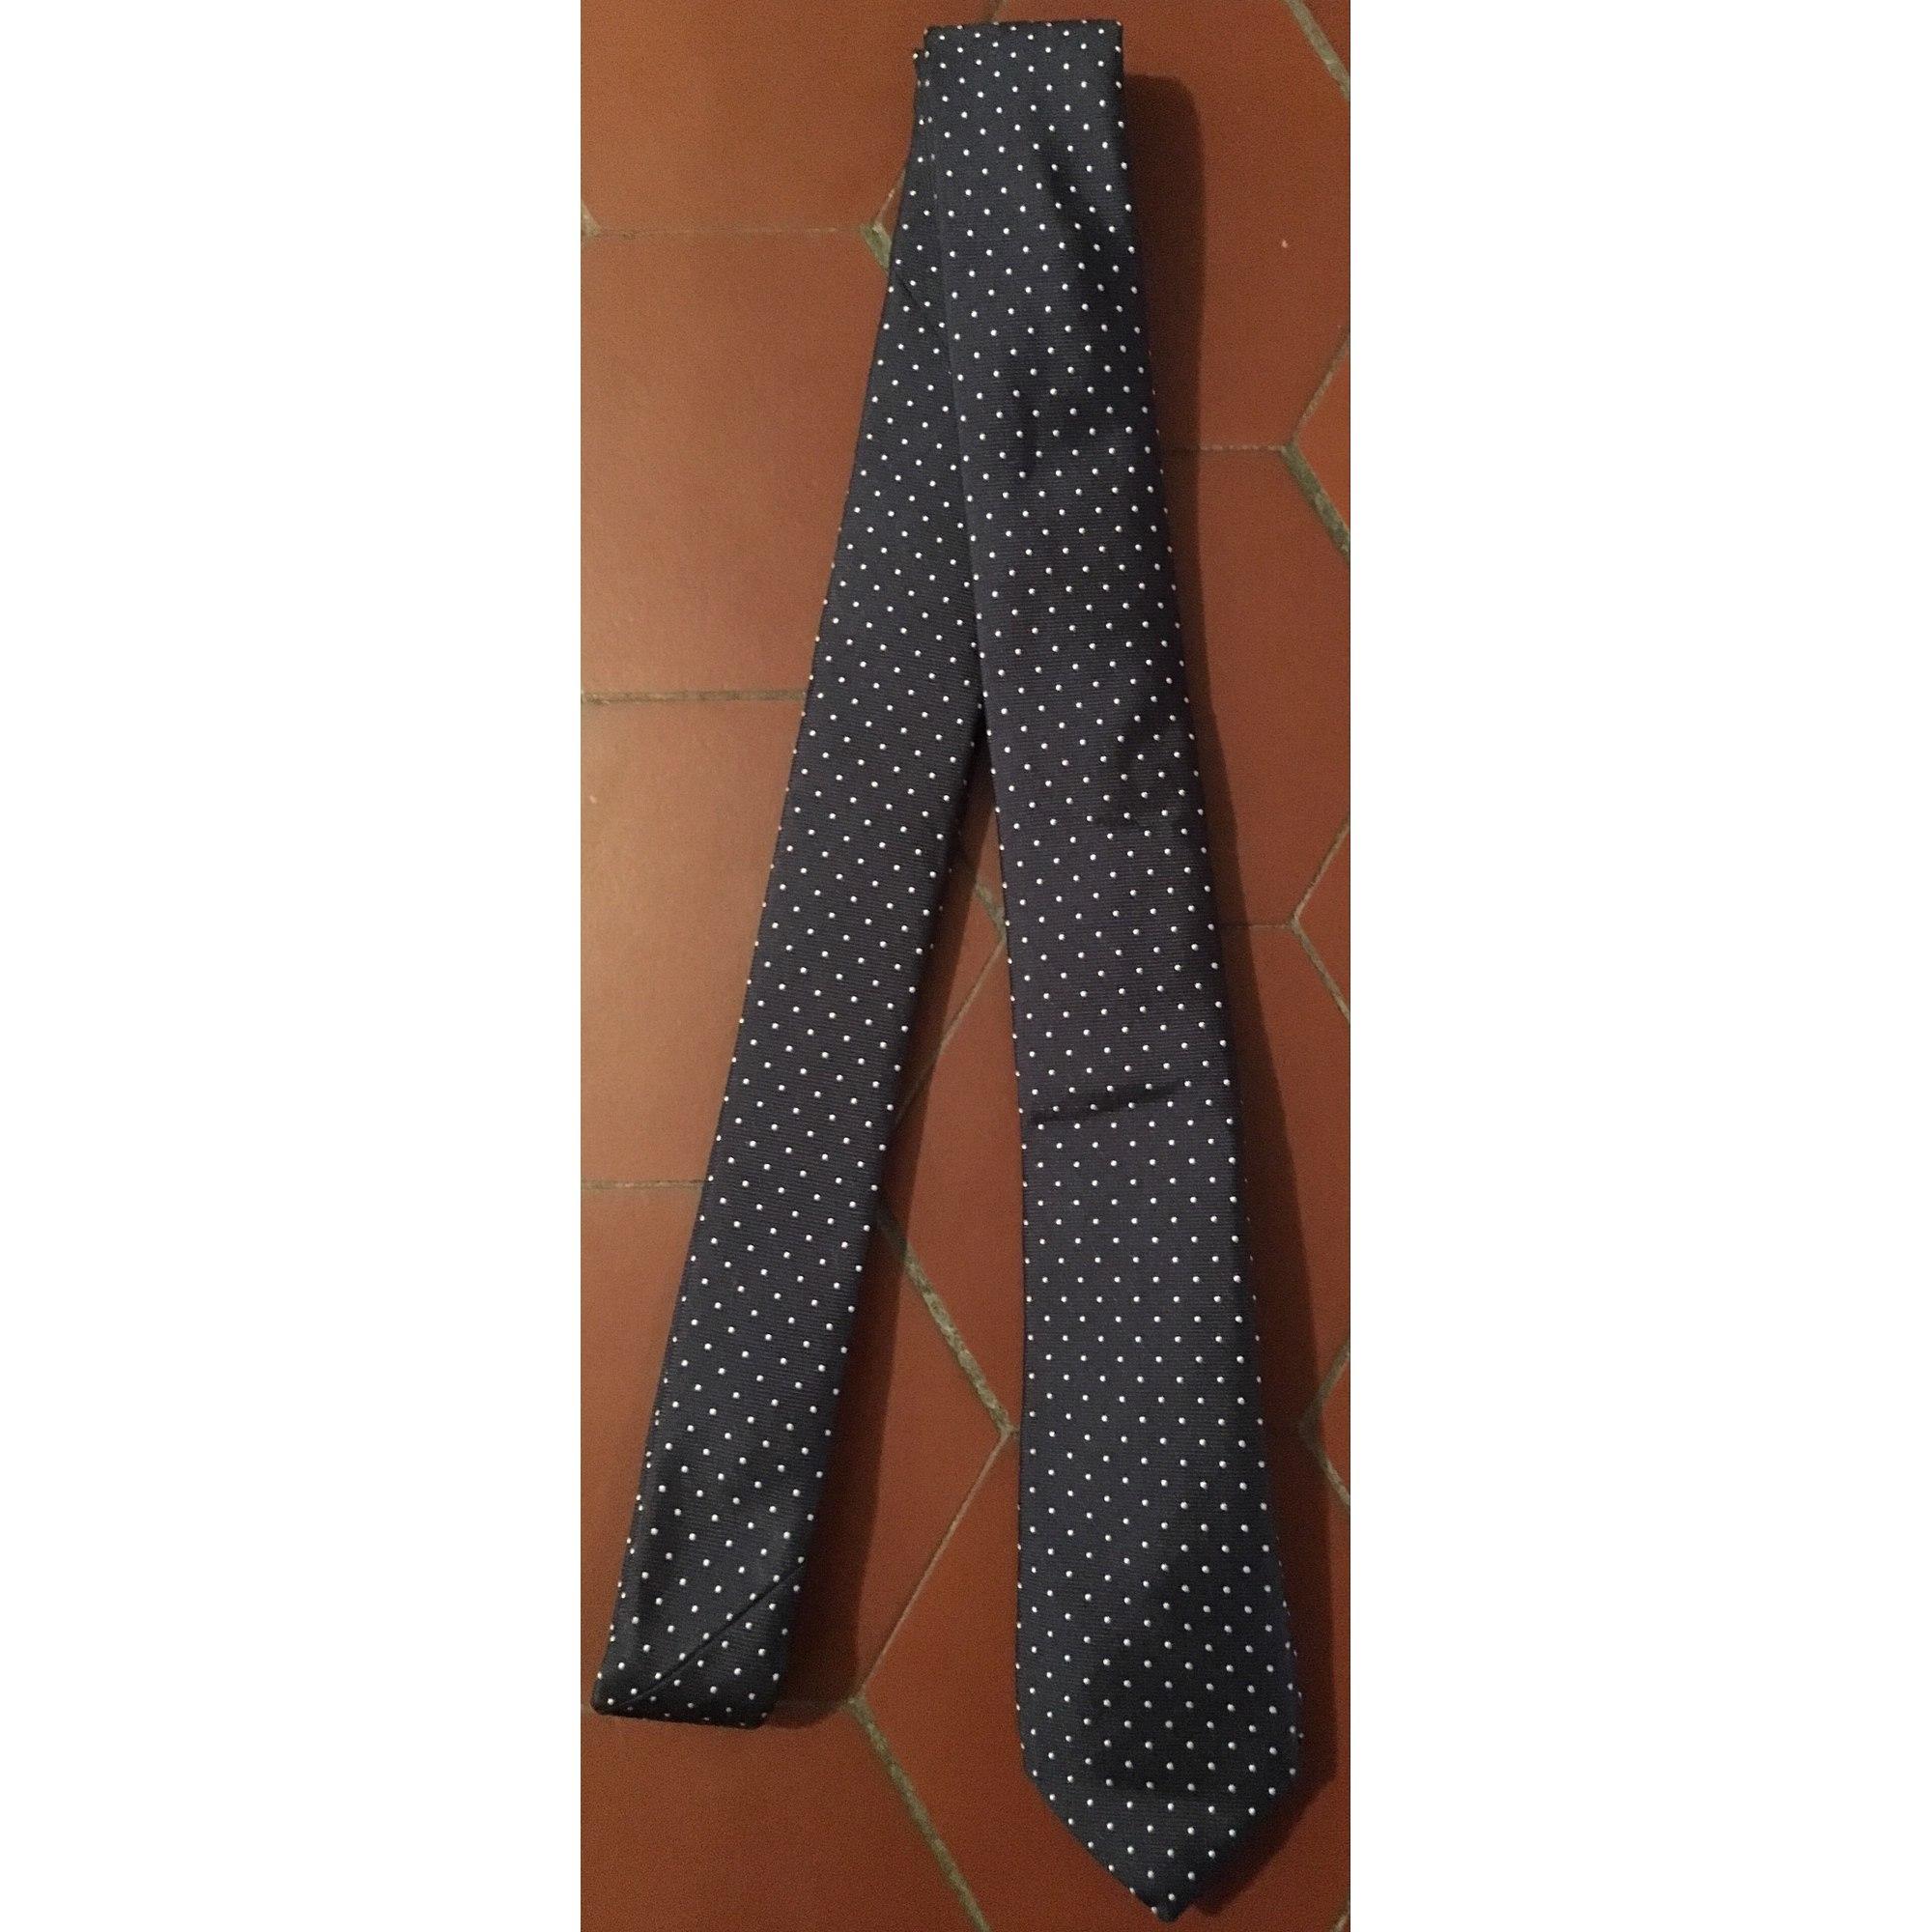 Cravate ALAIN FIGARET Bleu, bleu marine, bleu turquoise